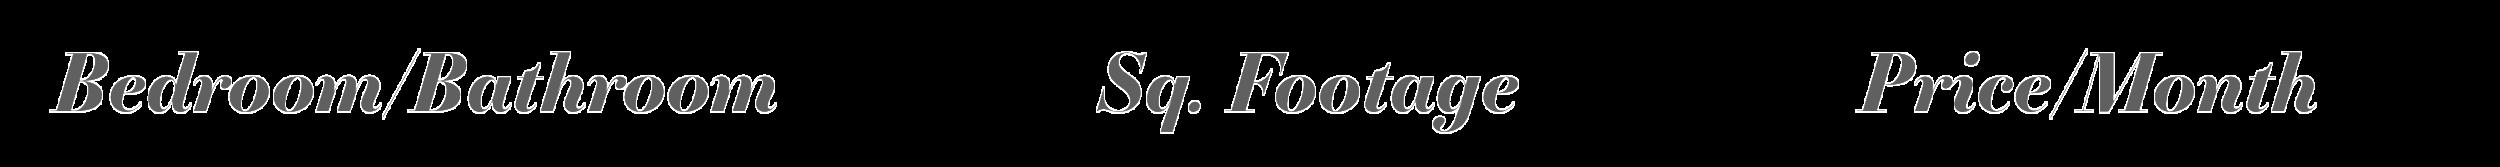 Floorplans_Marott_Table Header.png